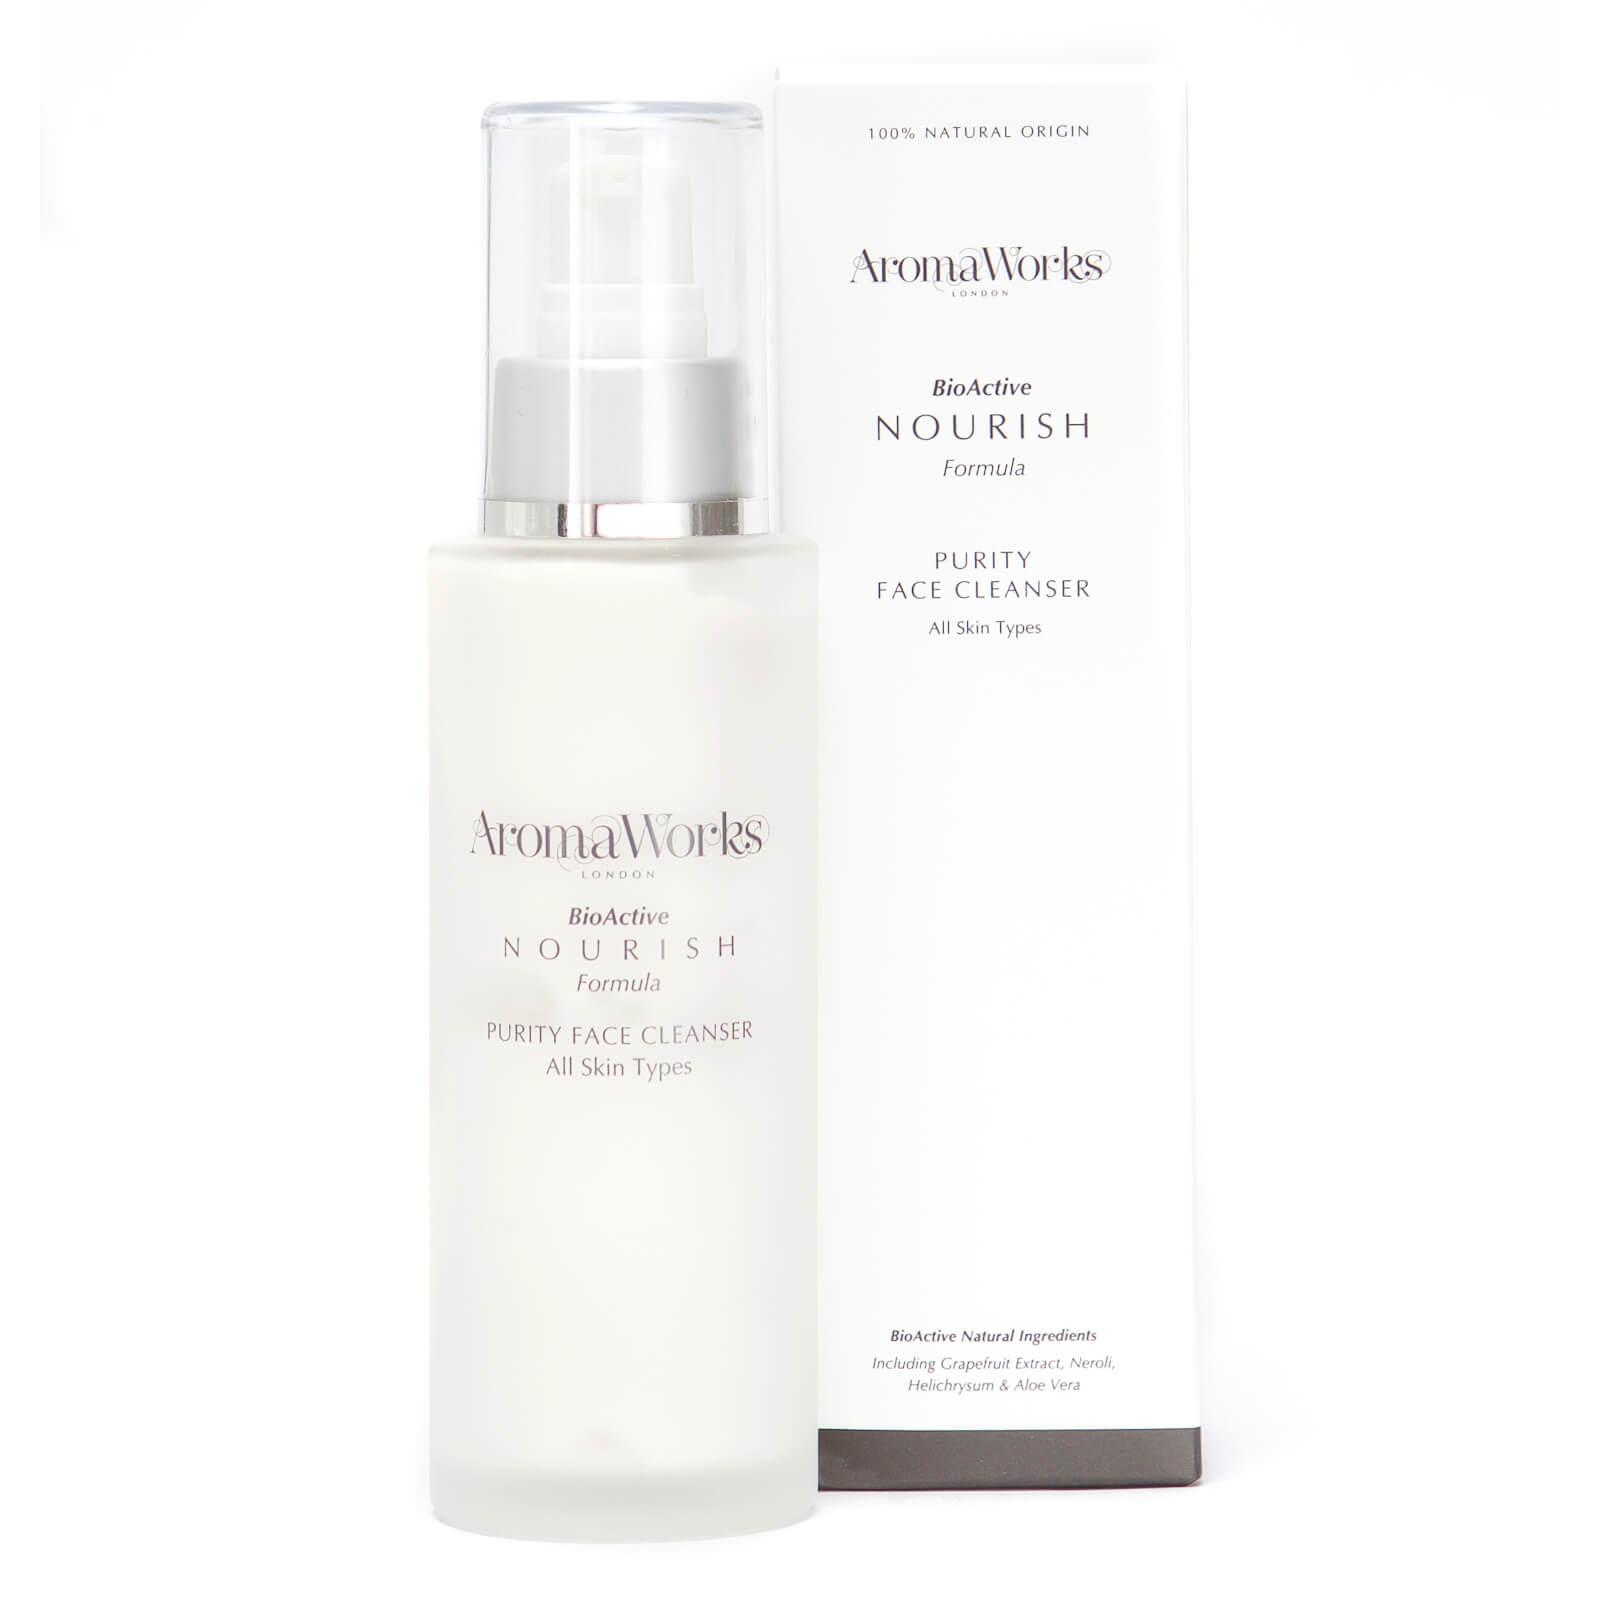 Купить Средство для снятия макияжа AromaWorks Purity Face Cleanser 100 мл